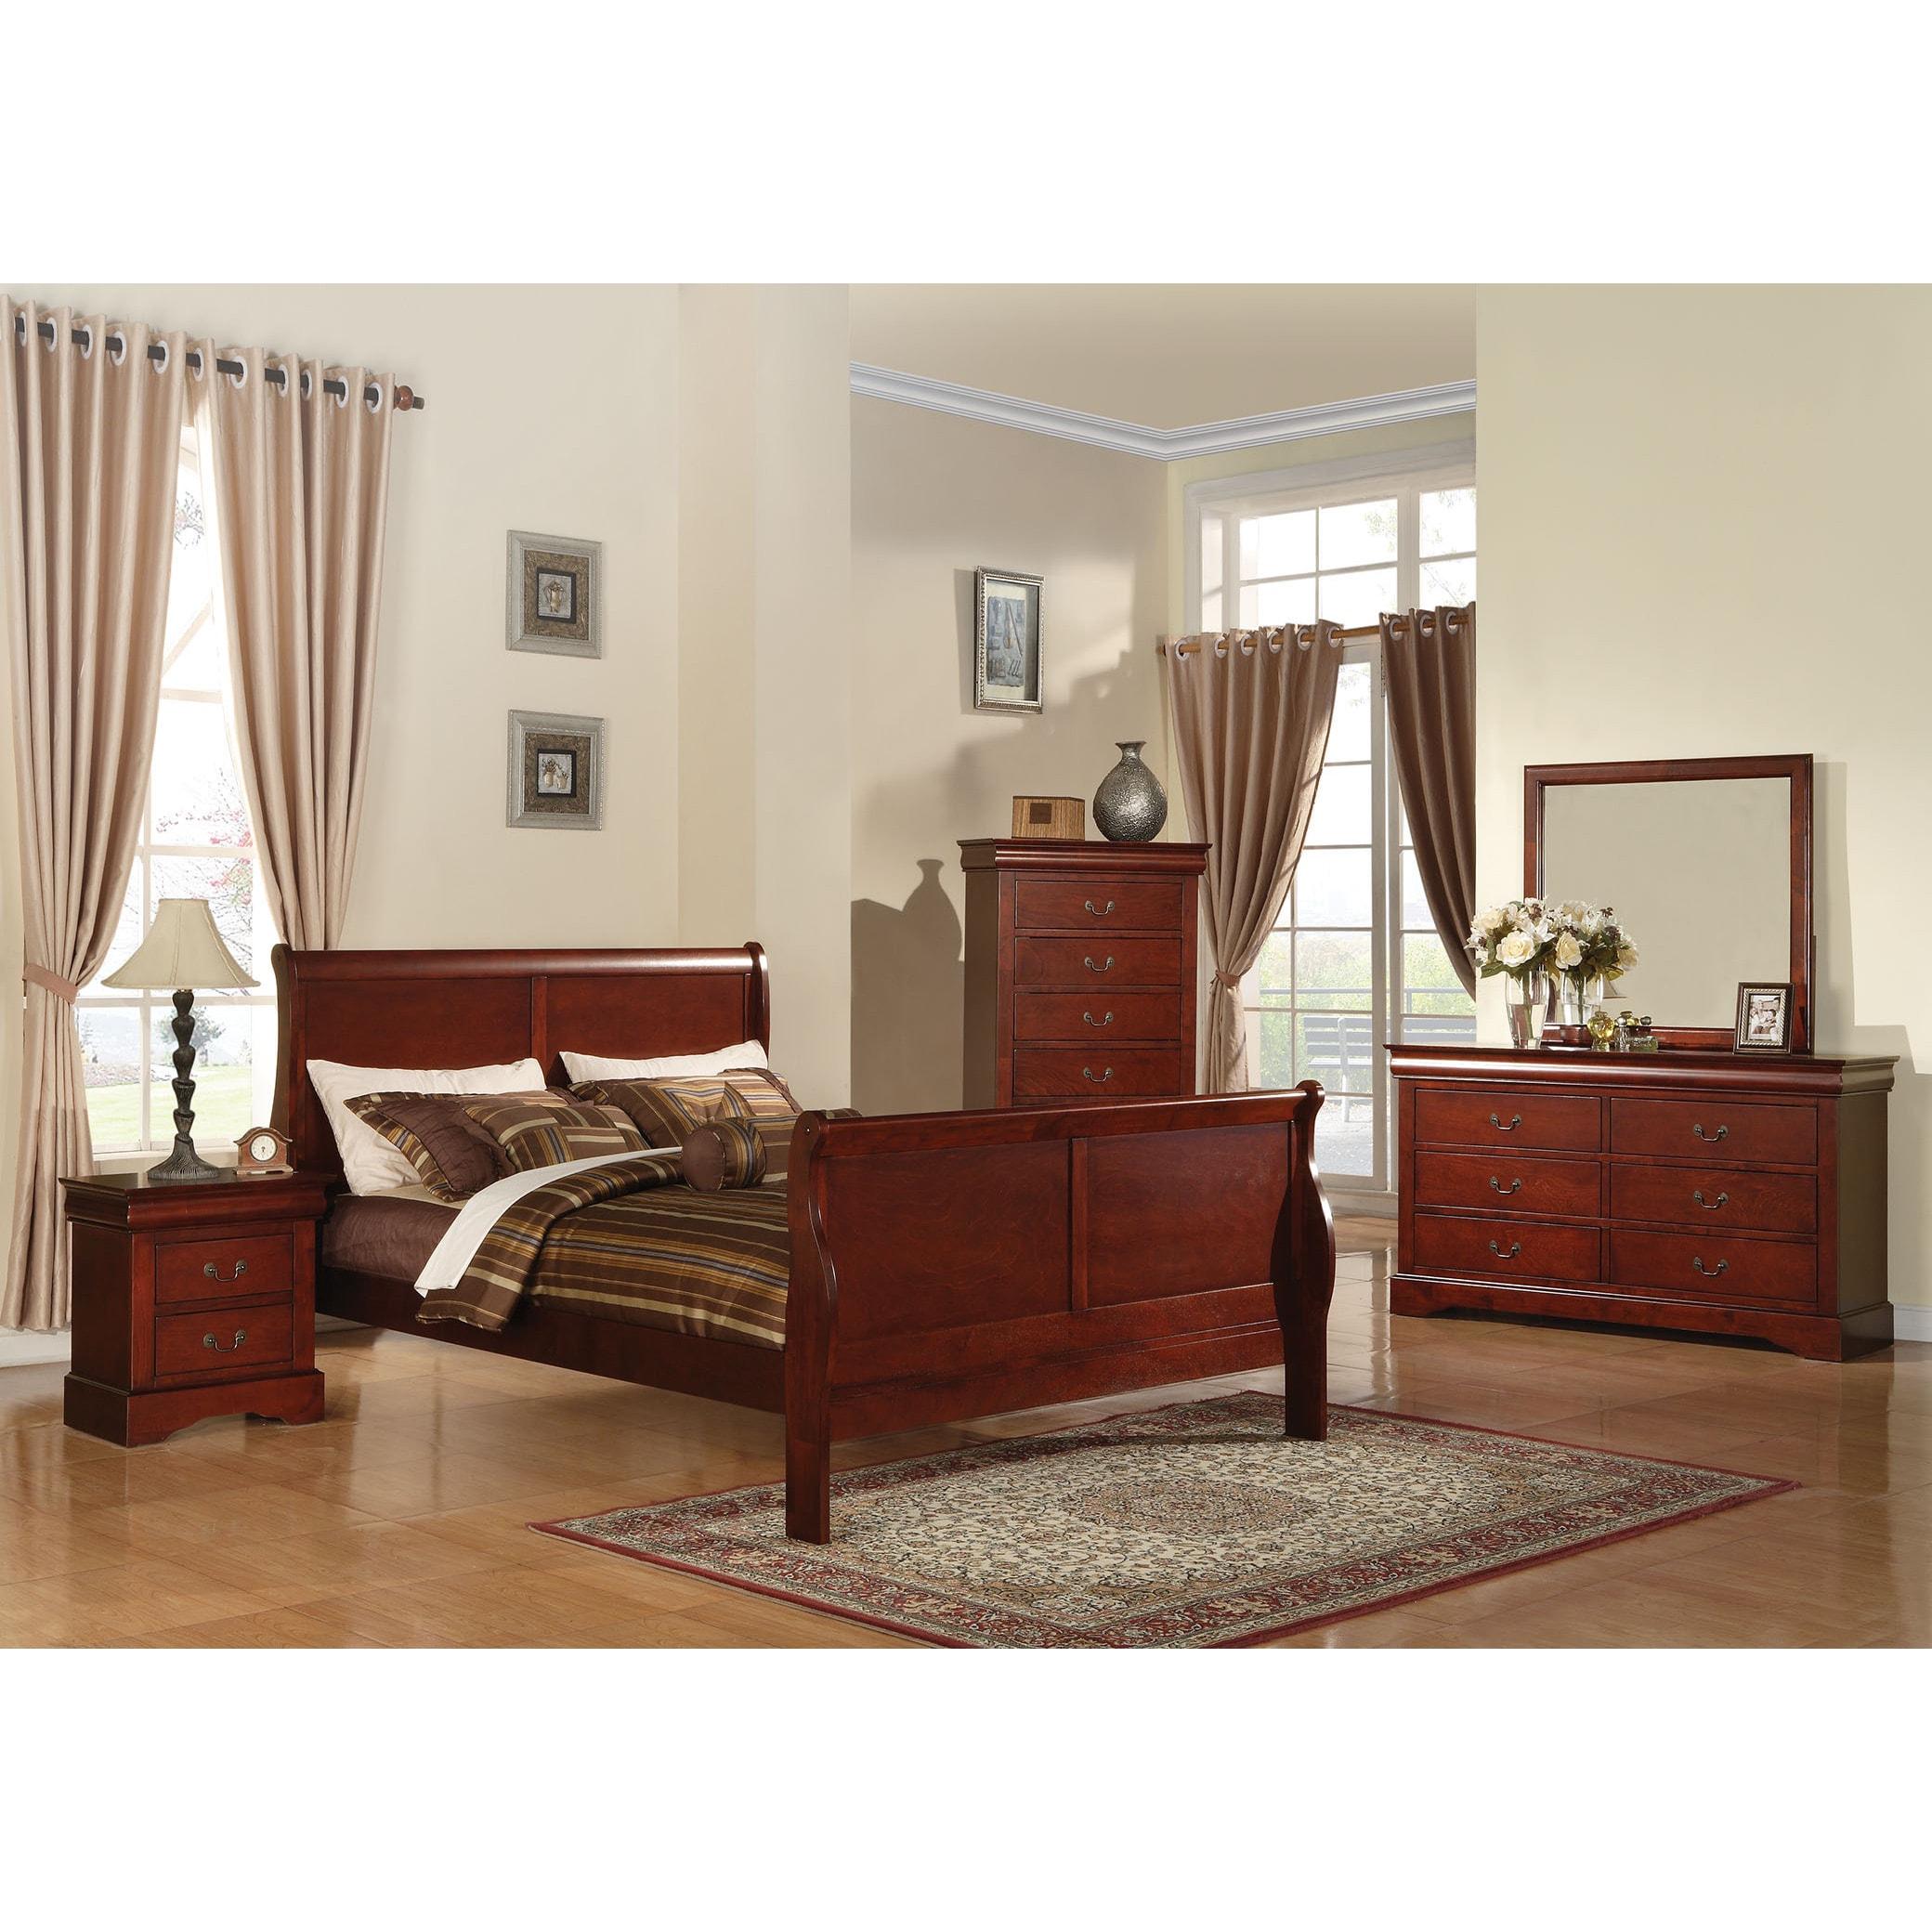 Buy Bedroom Sets Online At Overstock Our Best Bedroom